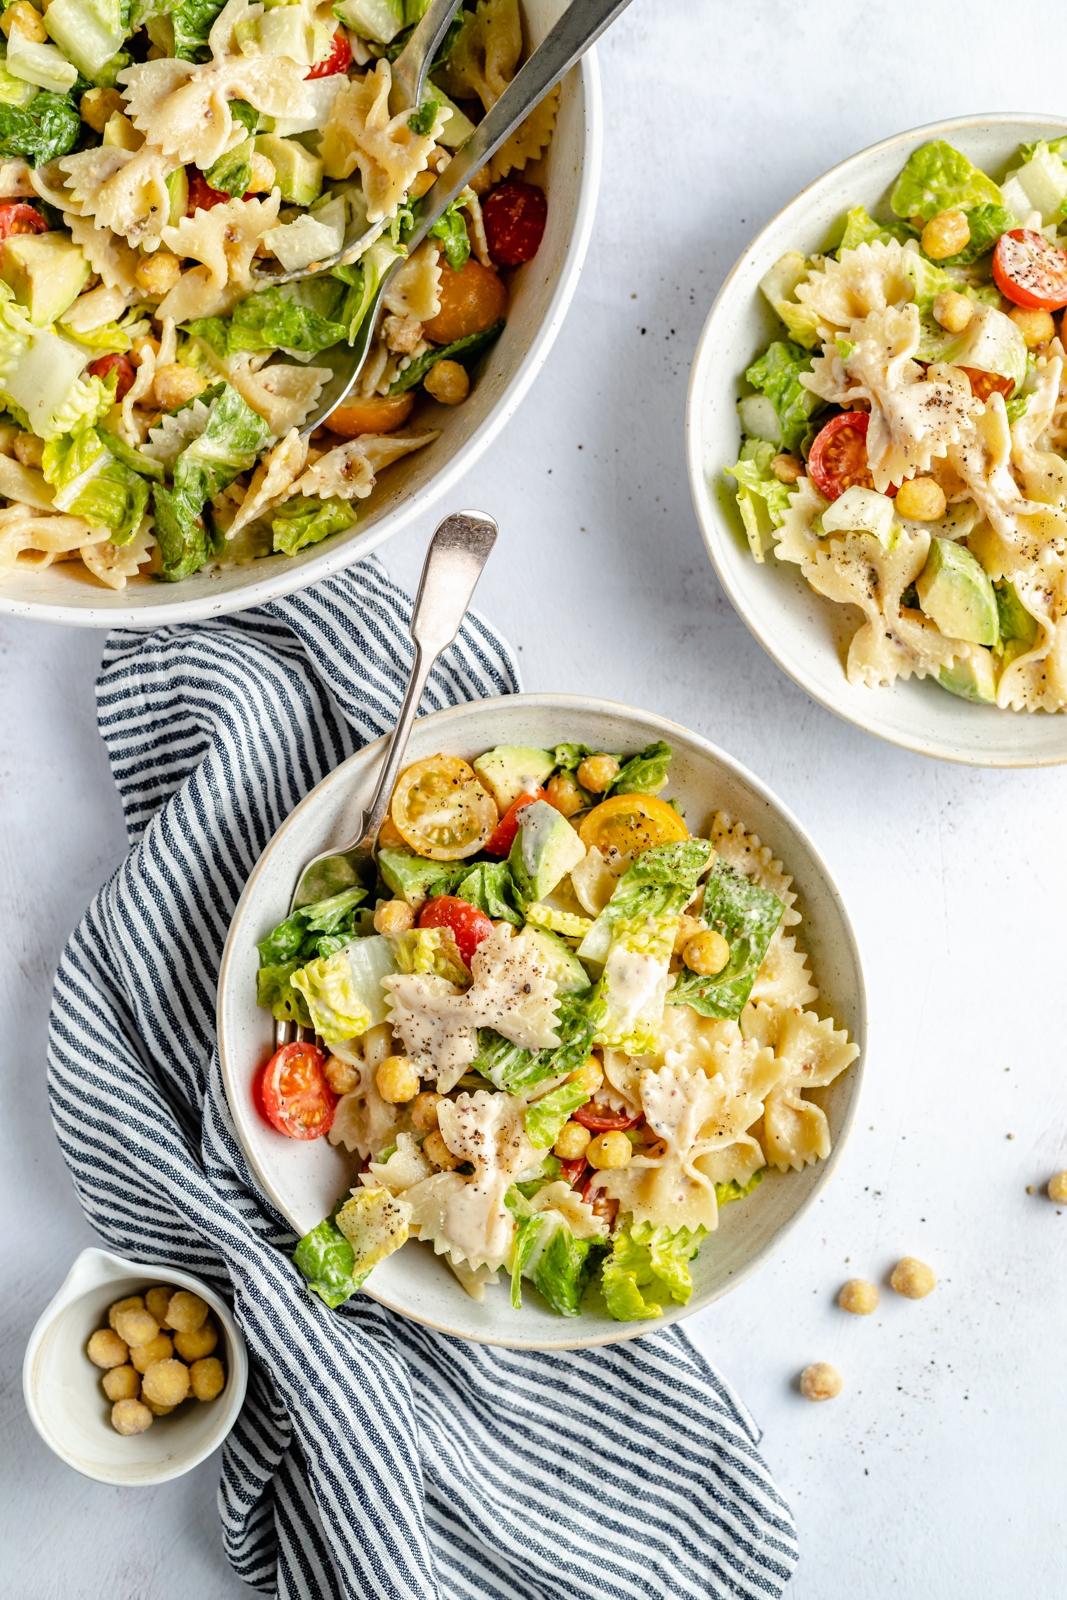 vegan caesar pasta salad in three bowls